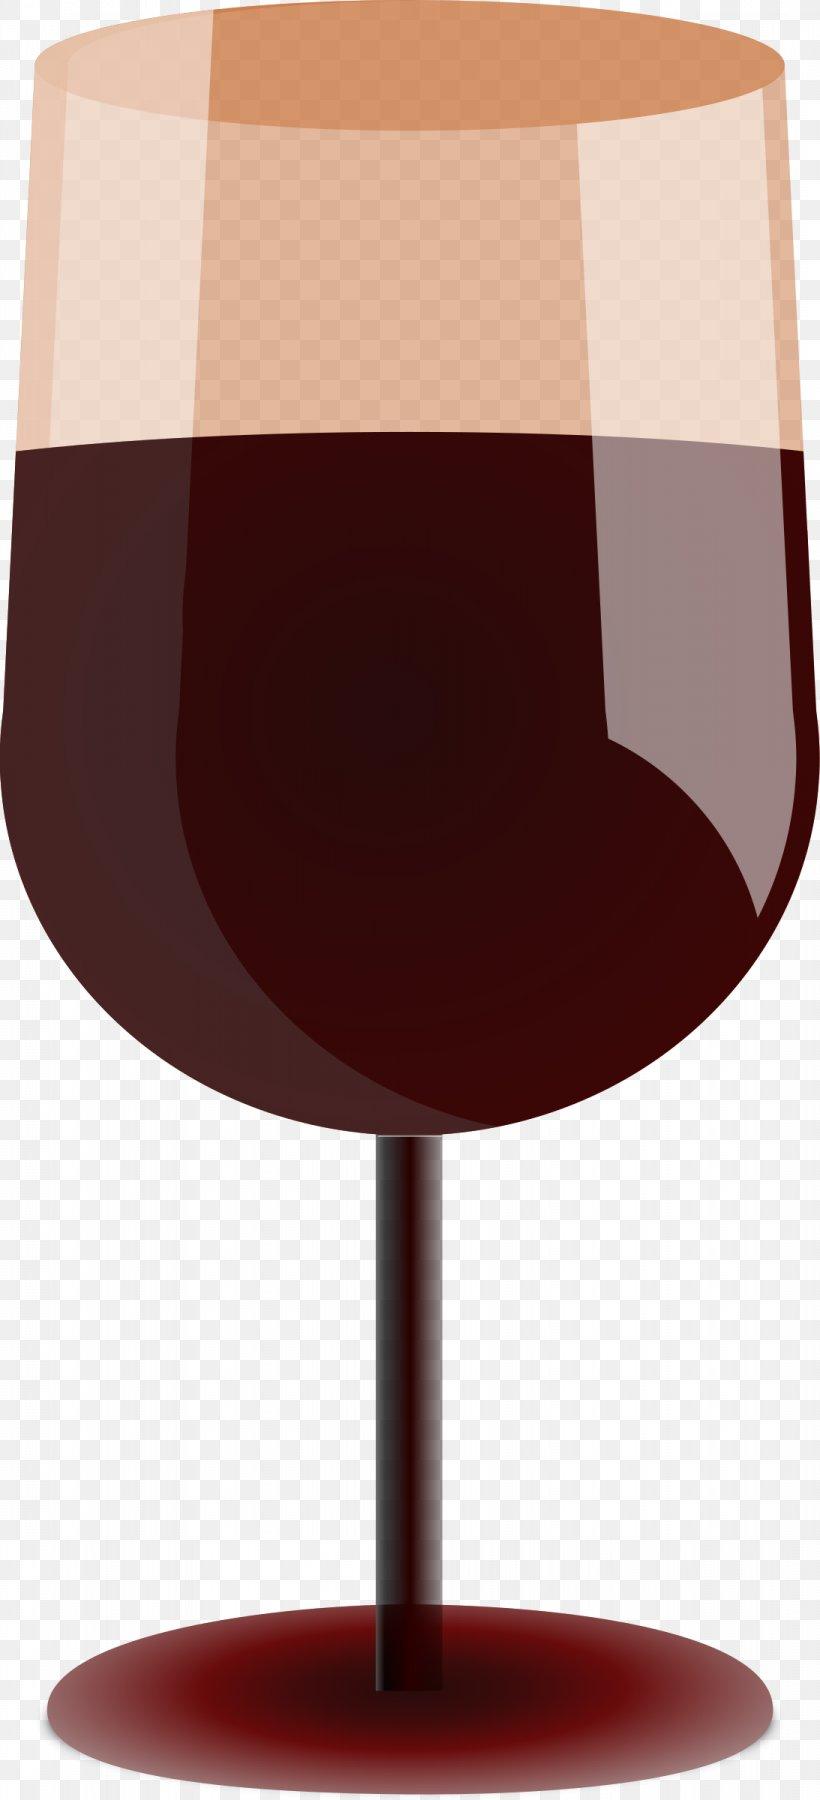 Wine Glass Clip Art, PNG, 1093x2400px, Wine, Bottle, Drink, Drinkware, Glass Download Free